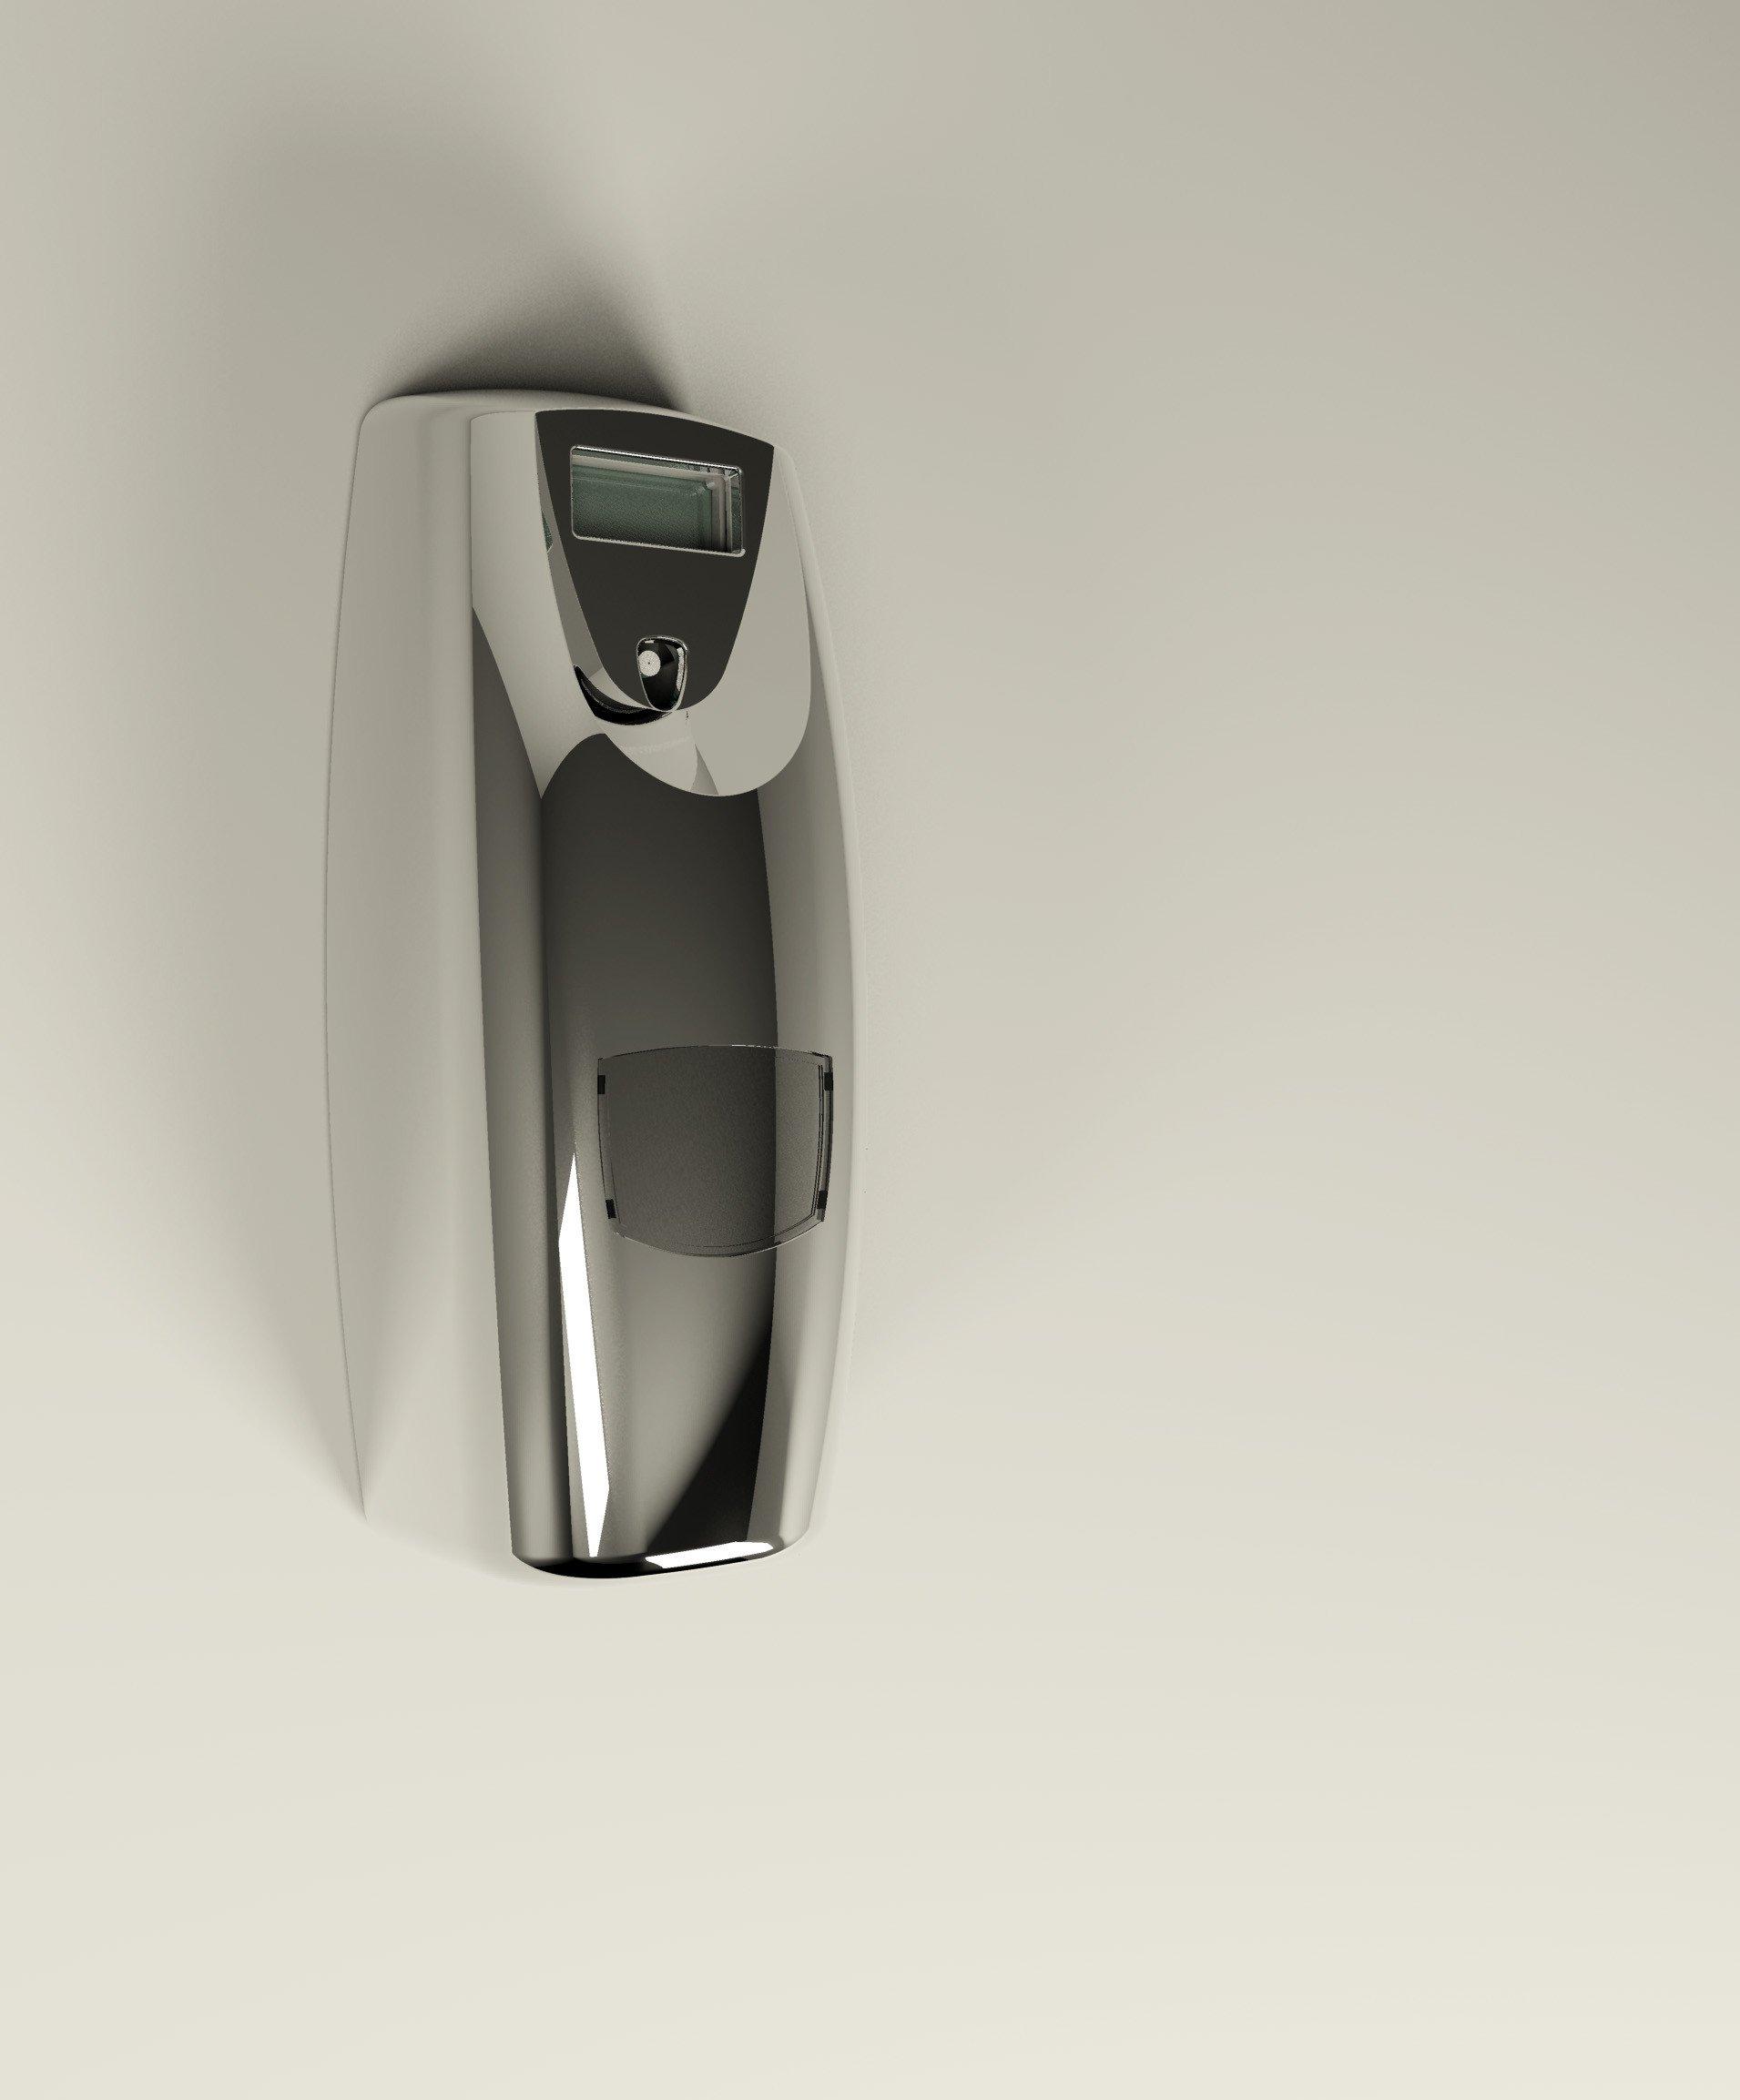 Vectair Micro Airoma Aerosol Dispenser Chrome Janitorial